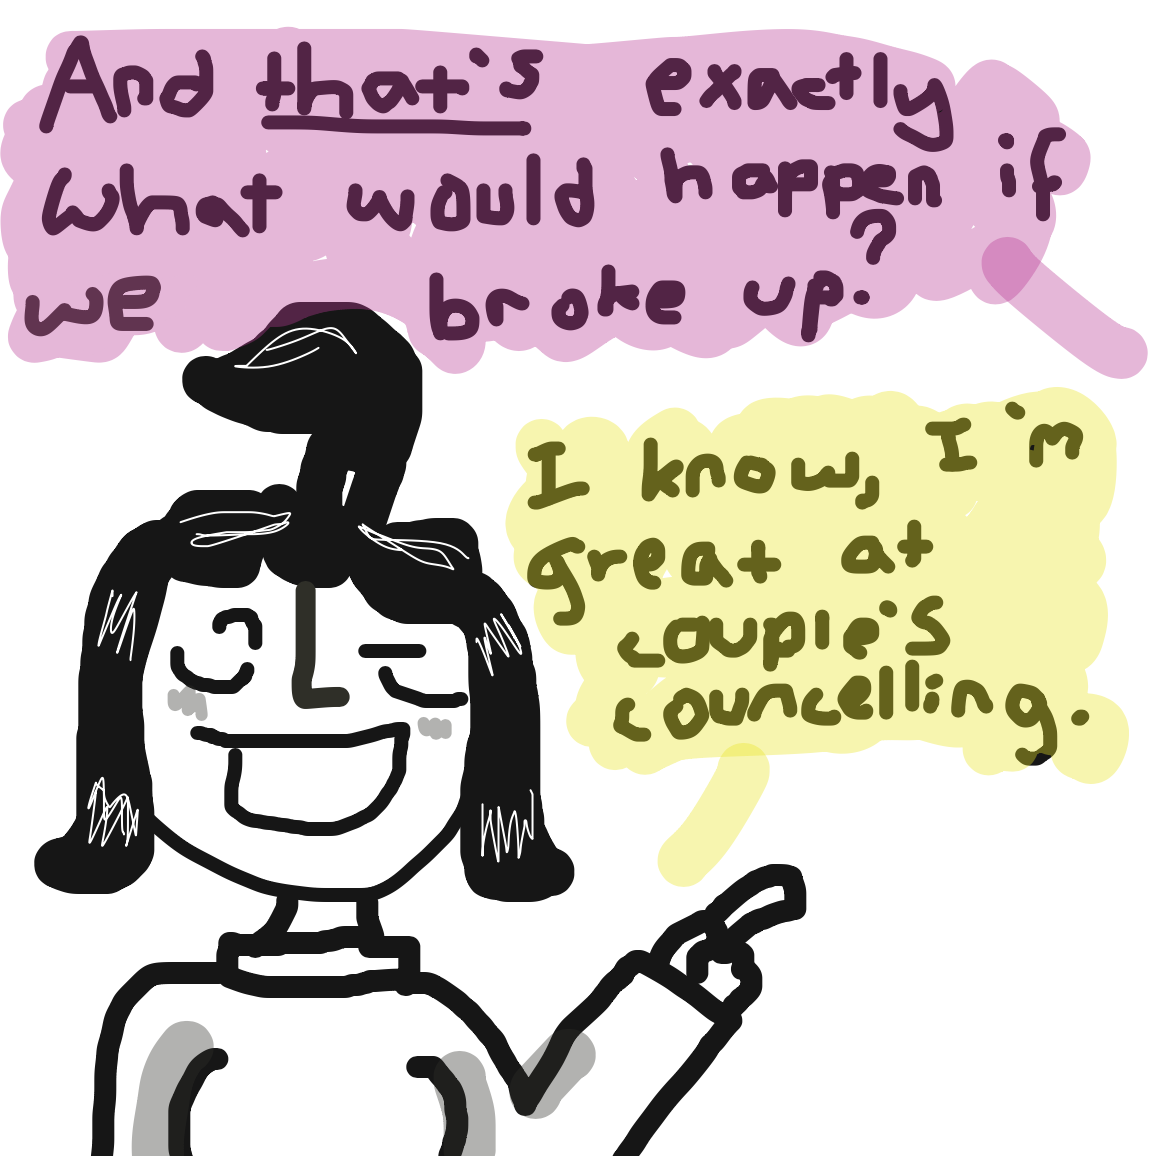 :') - Online Drawing Game Comic Strip Panel